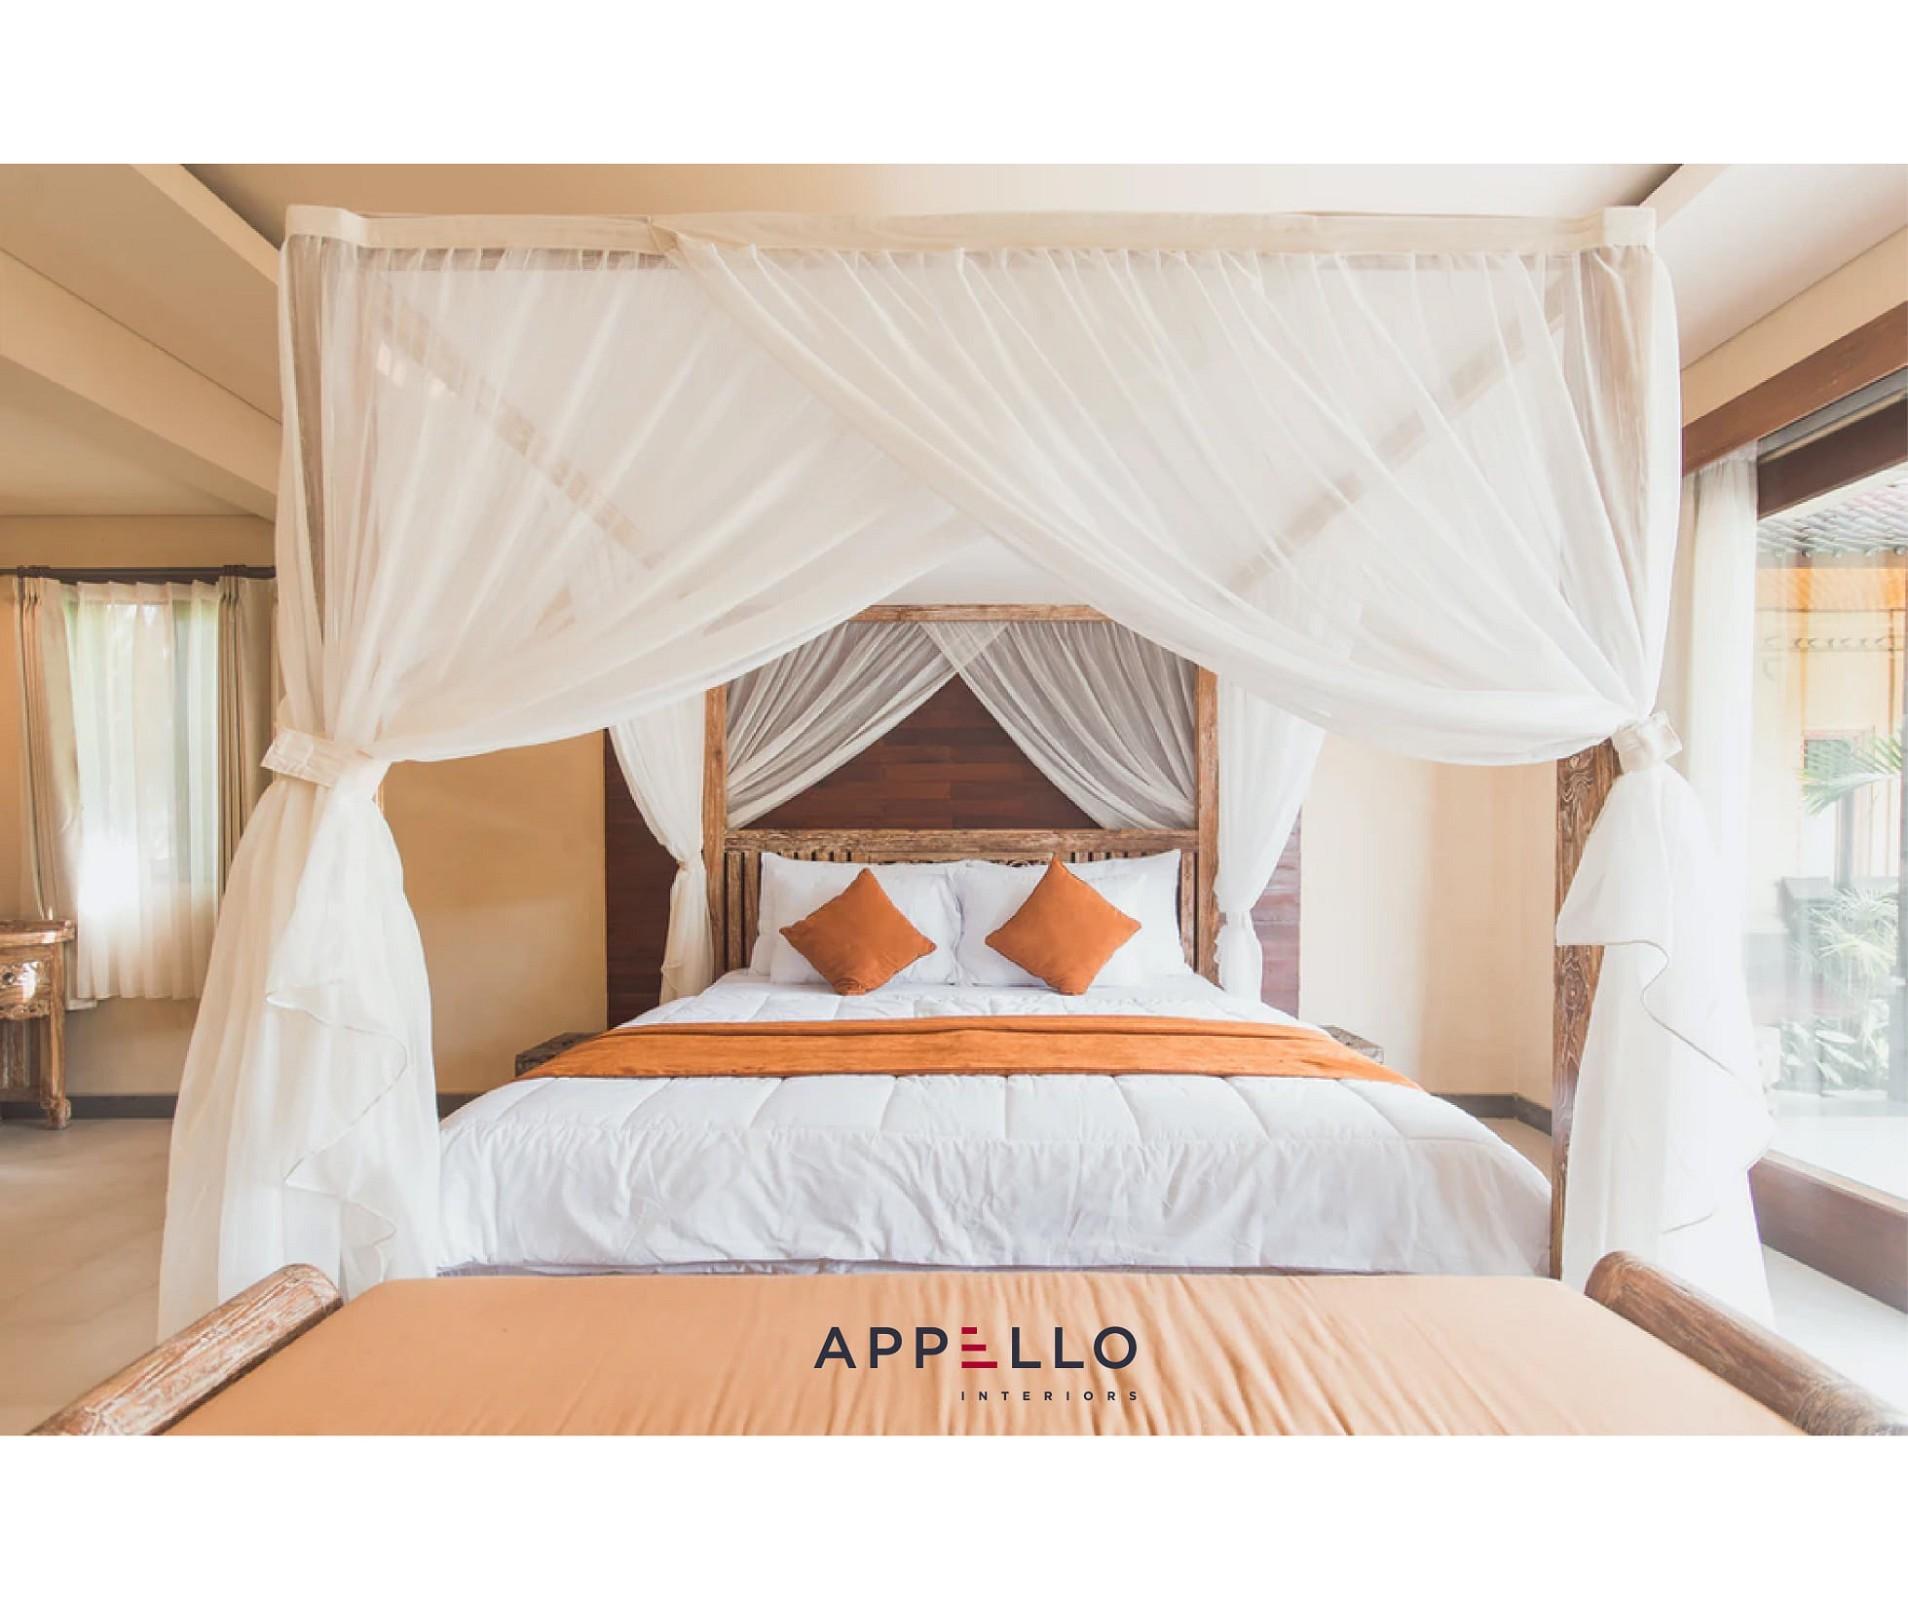 We provide custom made furniture in Dubai